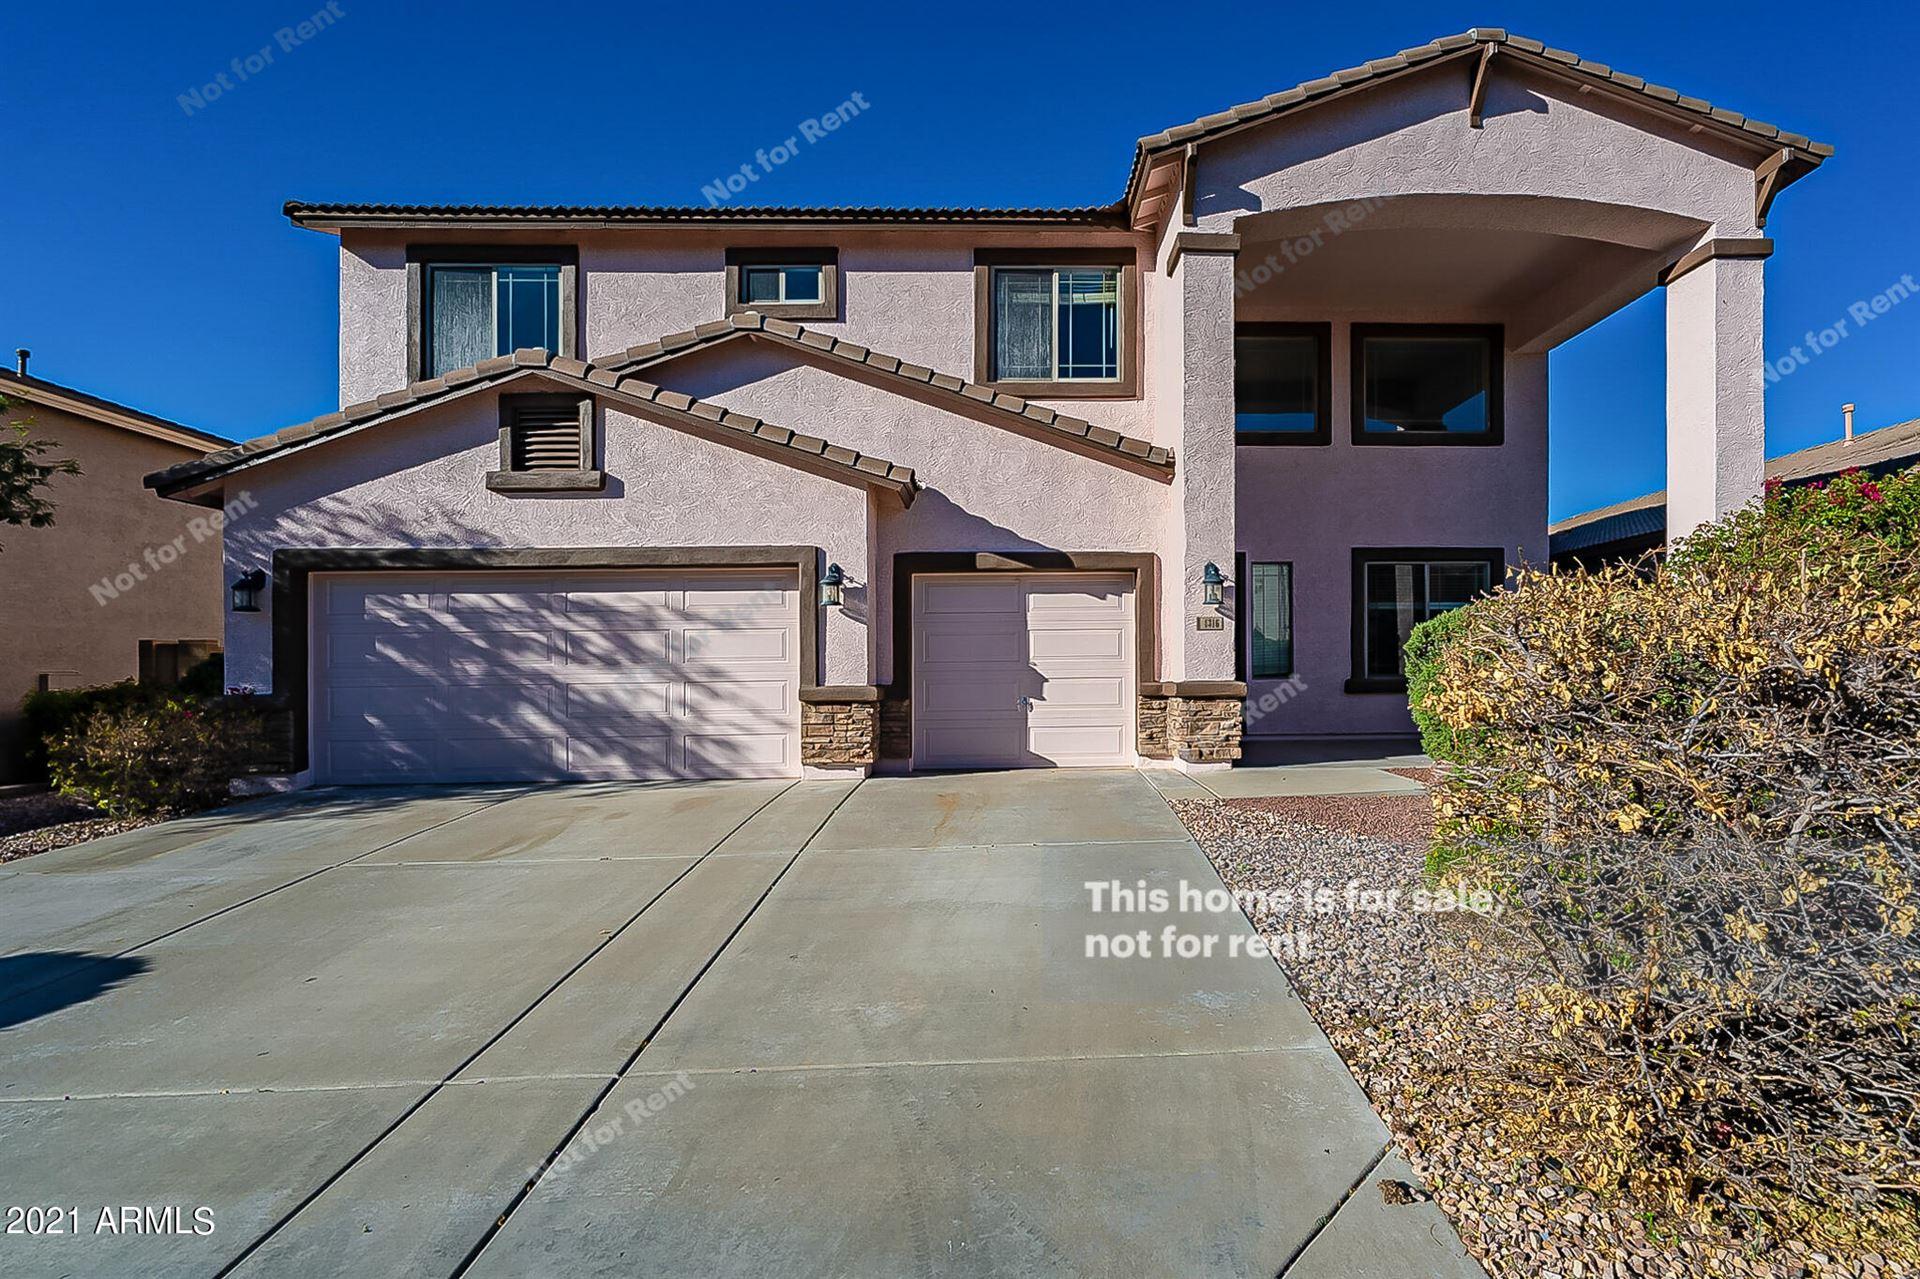 Photo of 4316 W DORSANEO Lane, New River, AZ 85087 (MLS # 6307243)